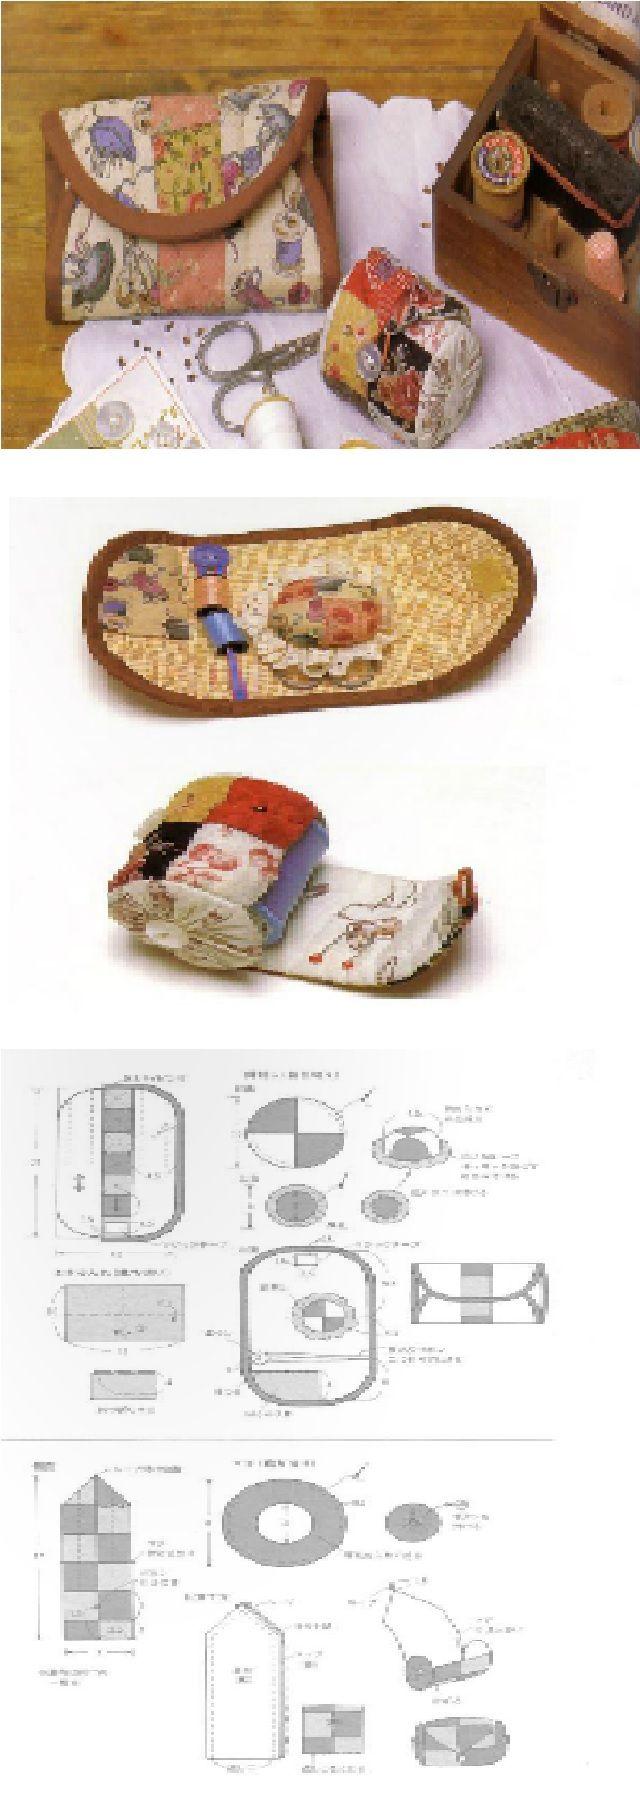 Mini sewing kit and pincushion ideas.